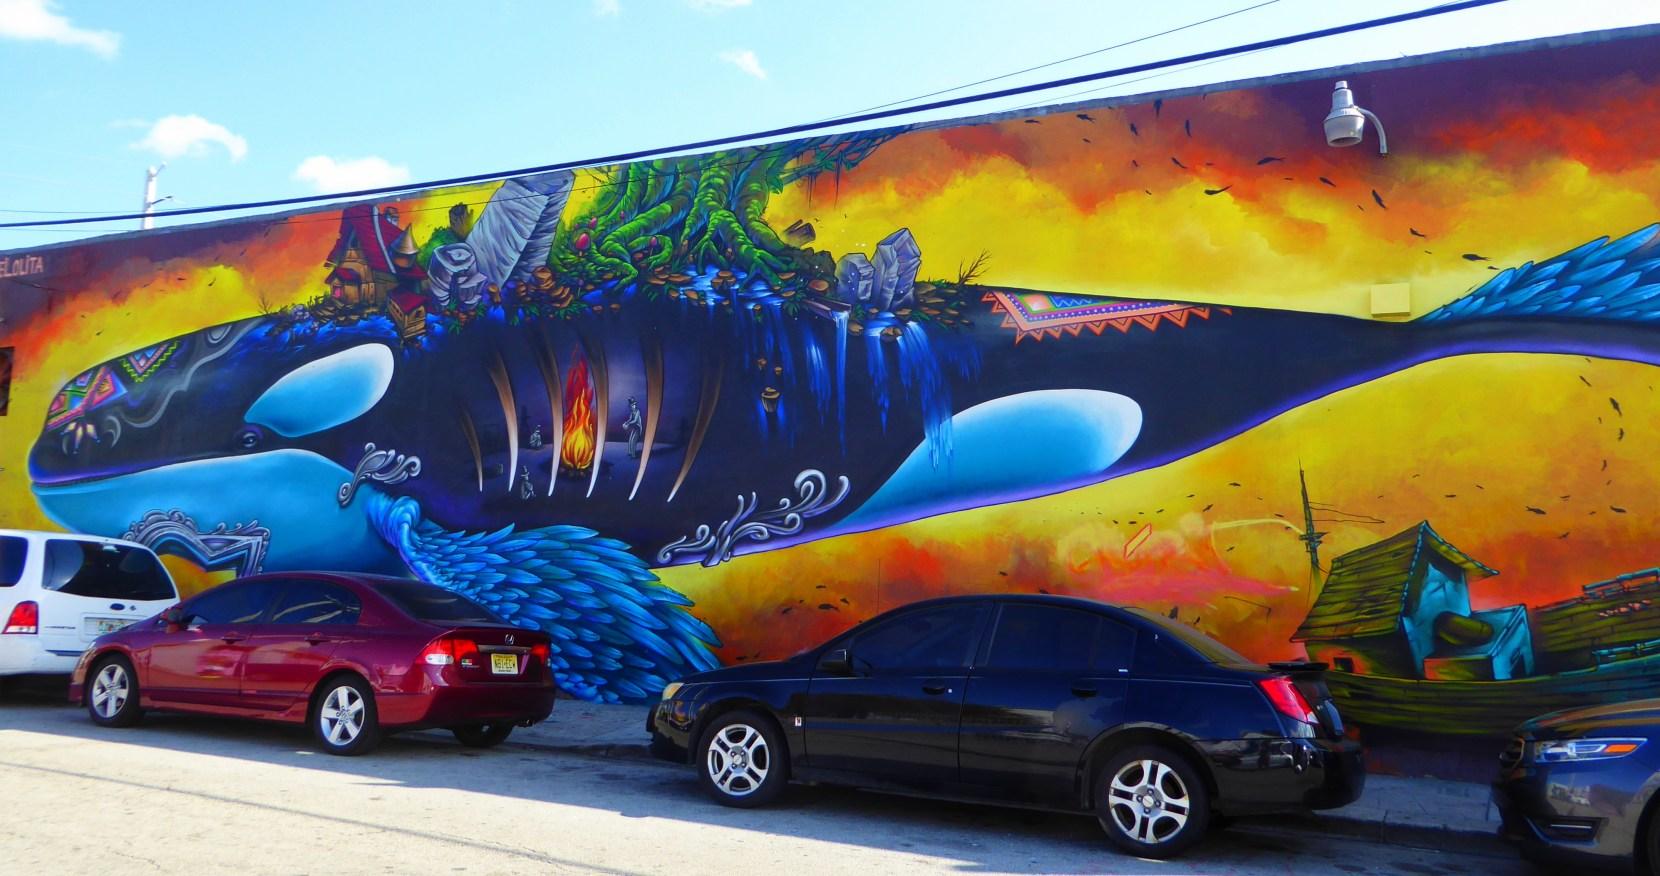 wynwood walls miami florida street art colourful killer whale